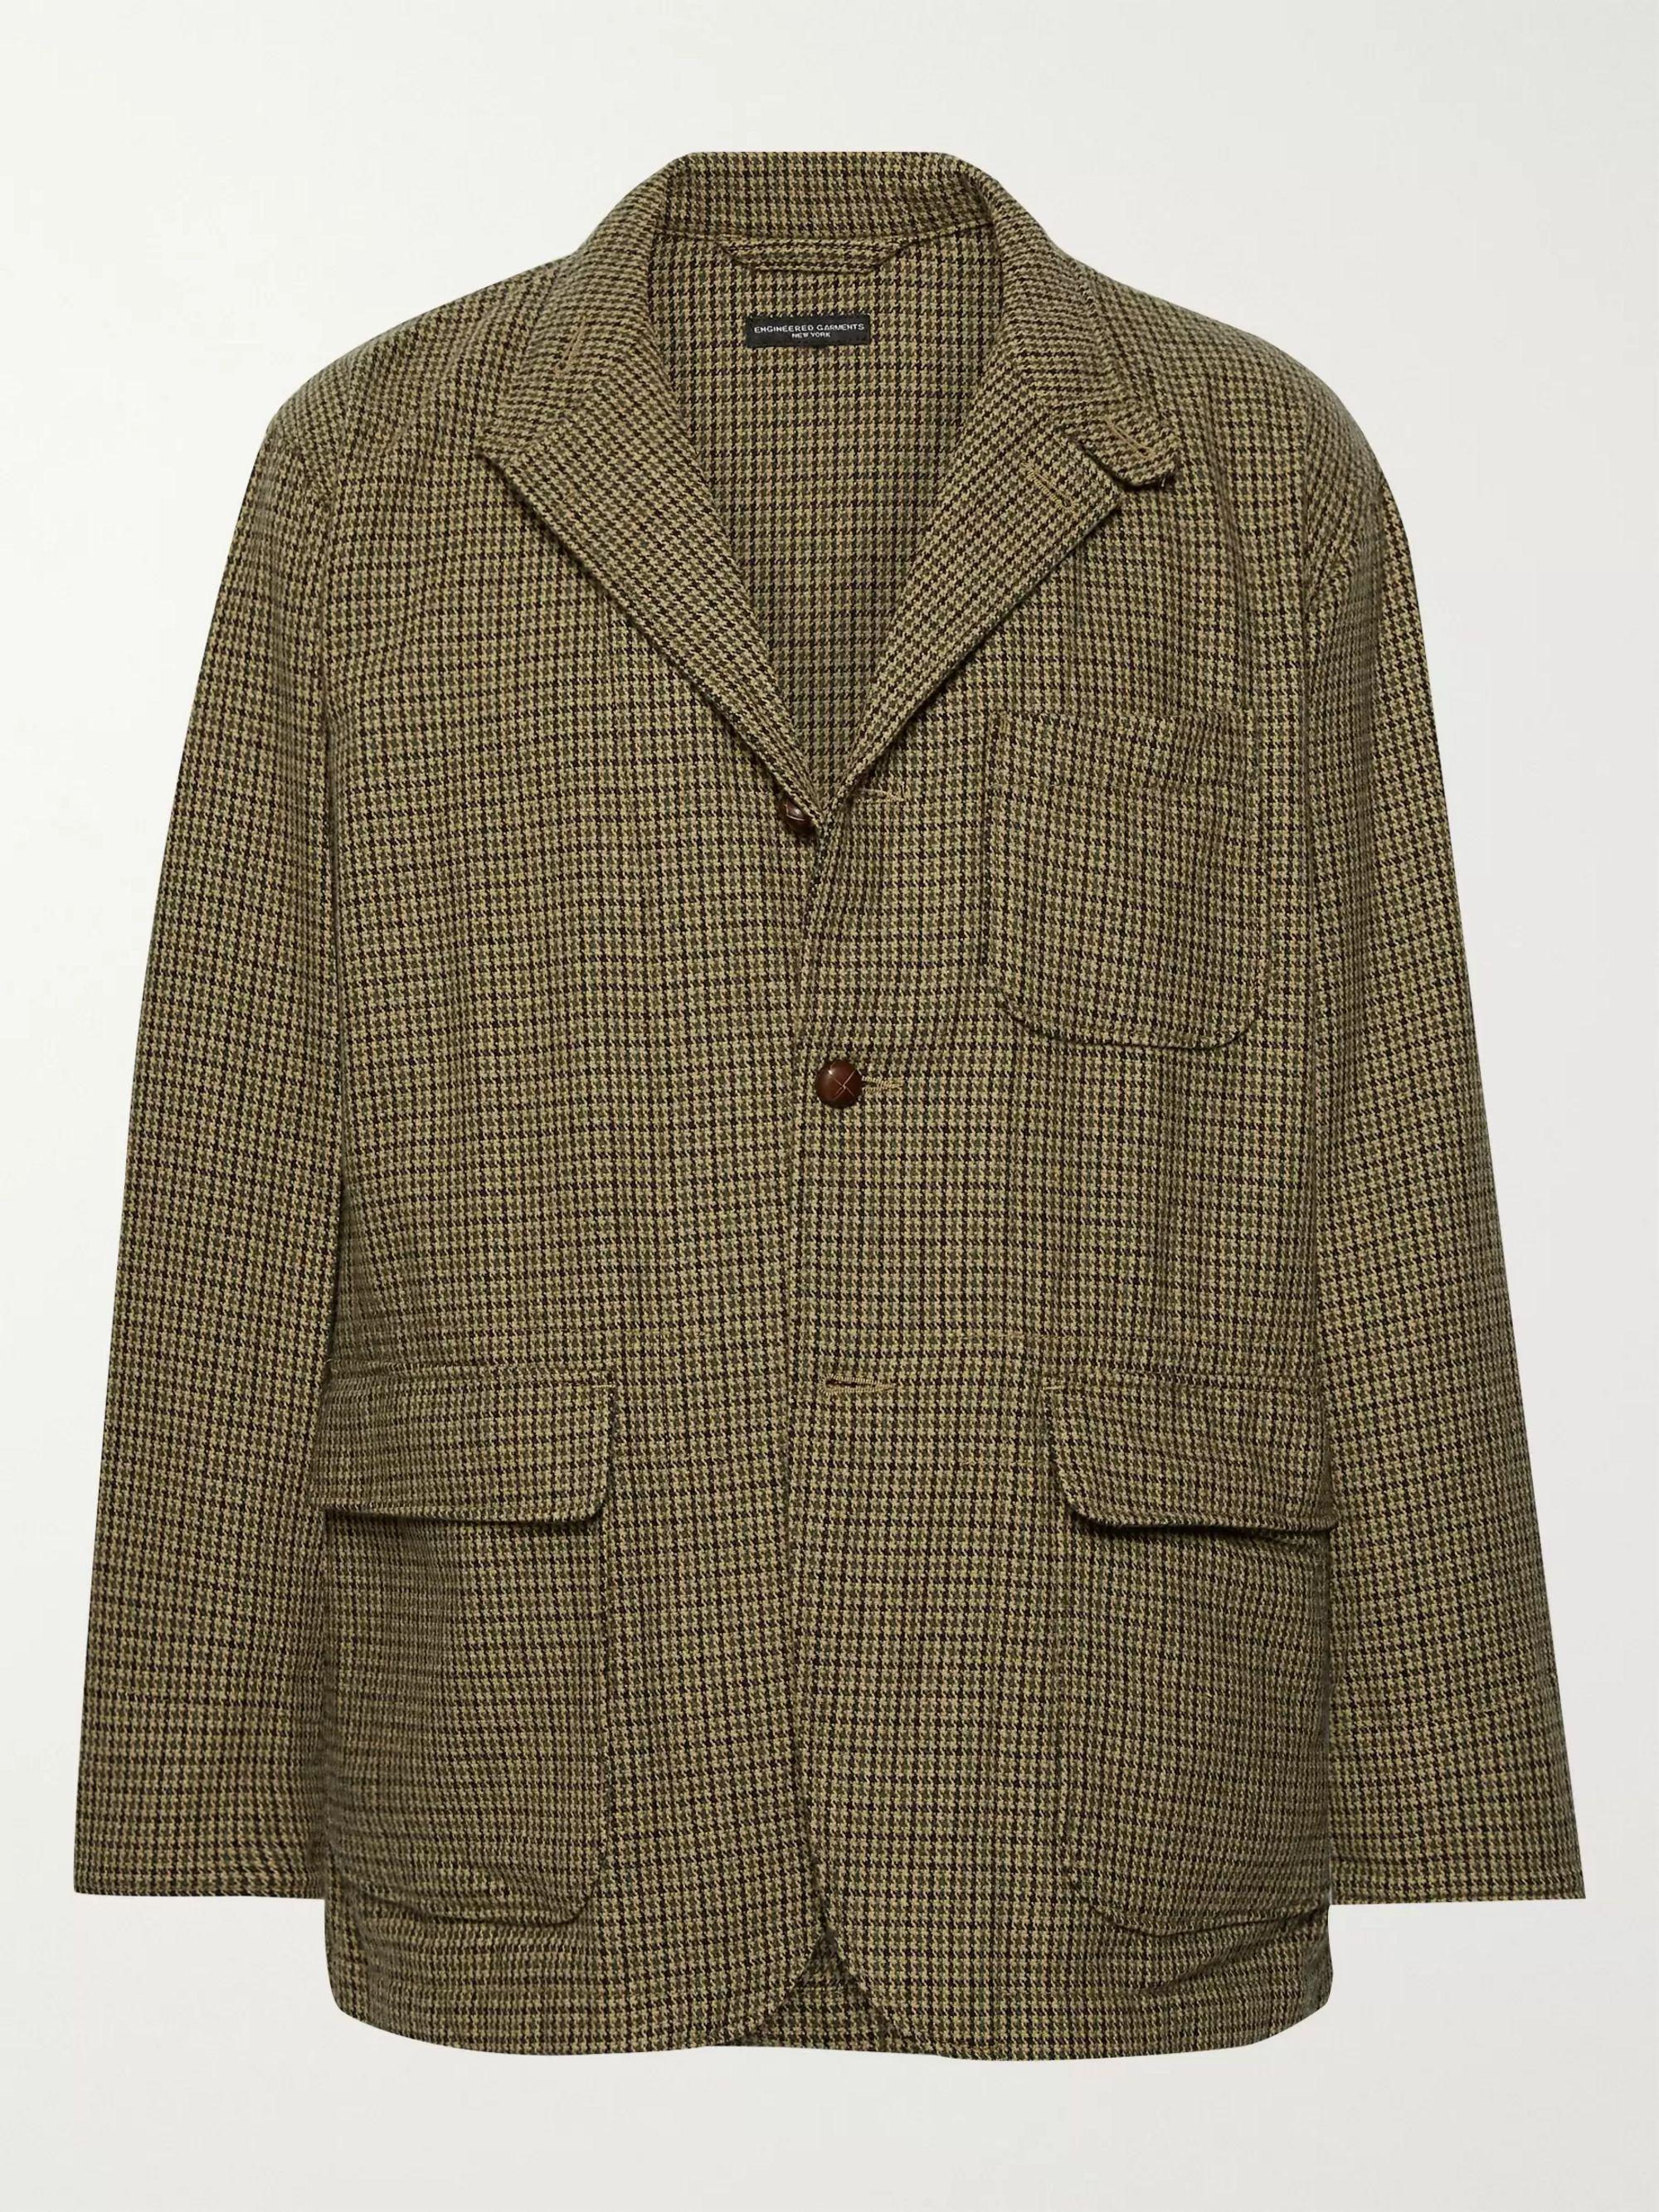 unstructured-puppytooth-woven-blazer by engineered-garments